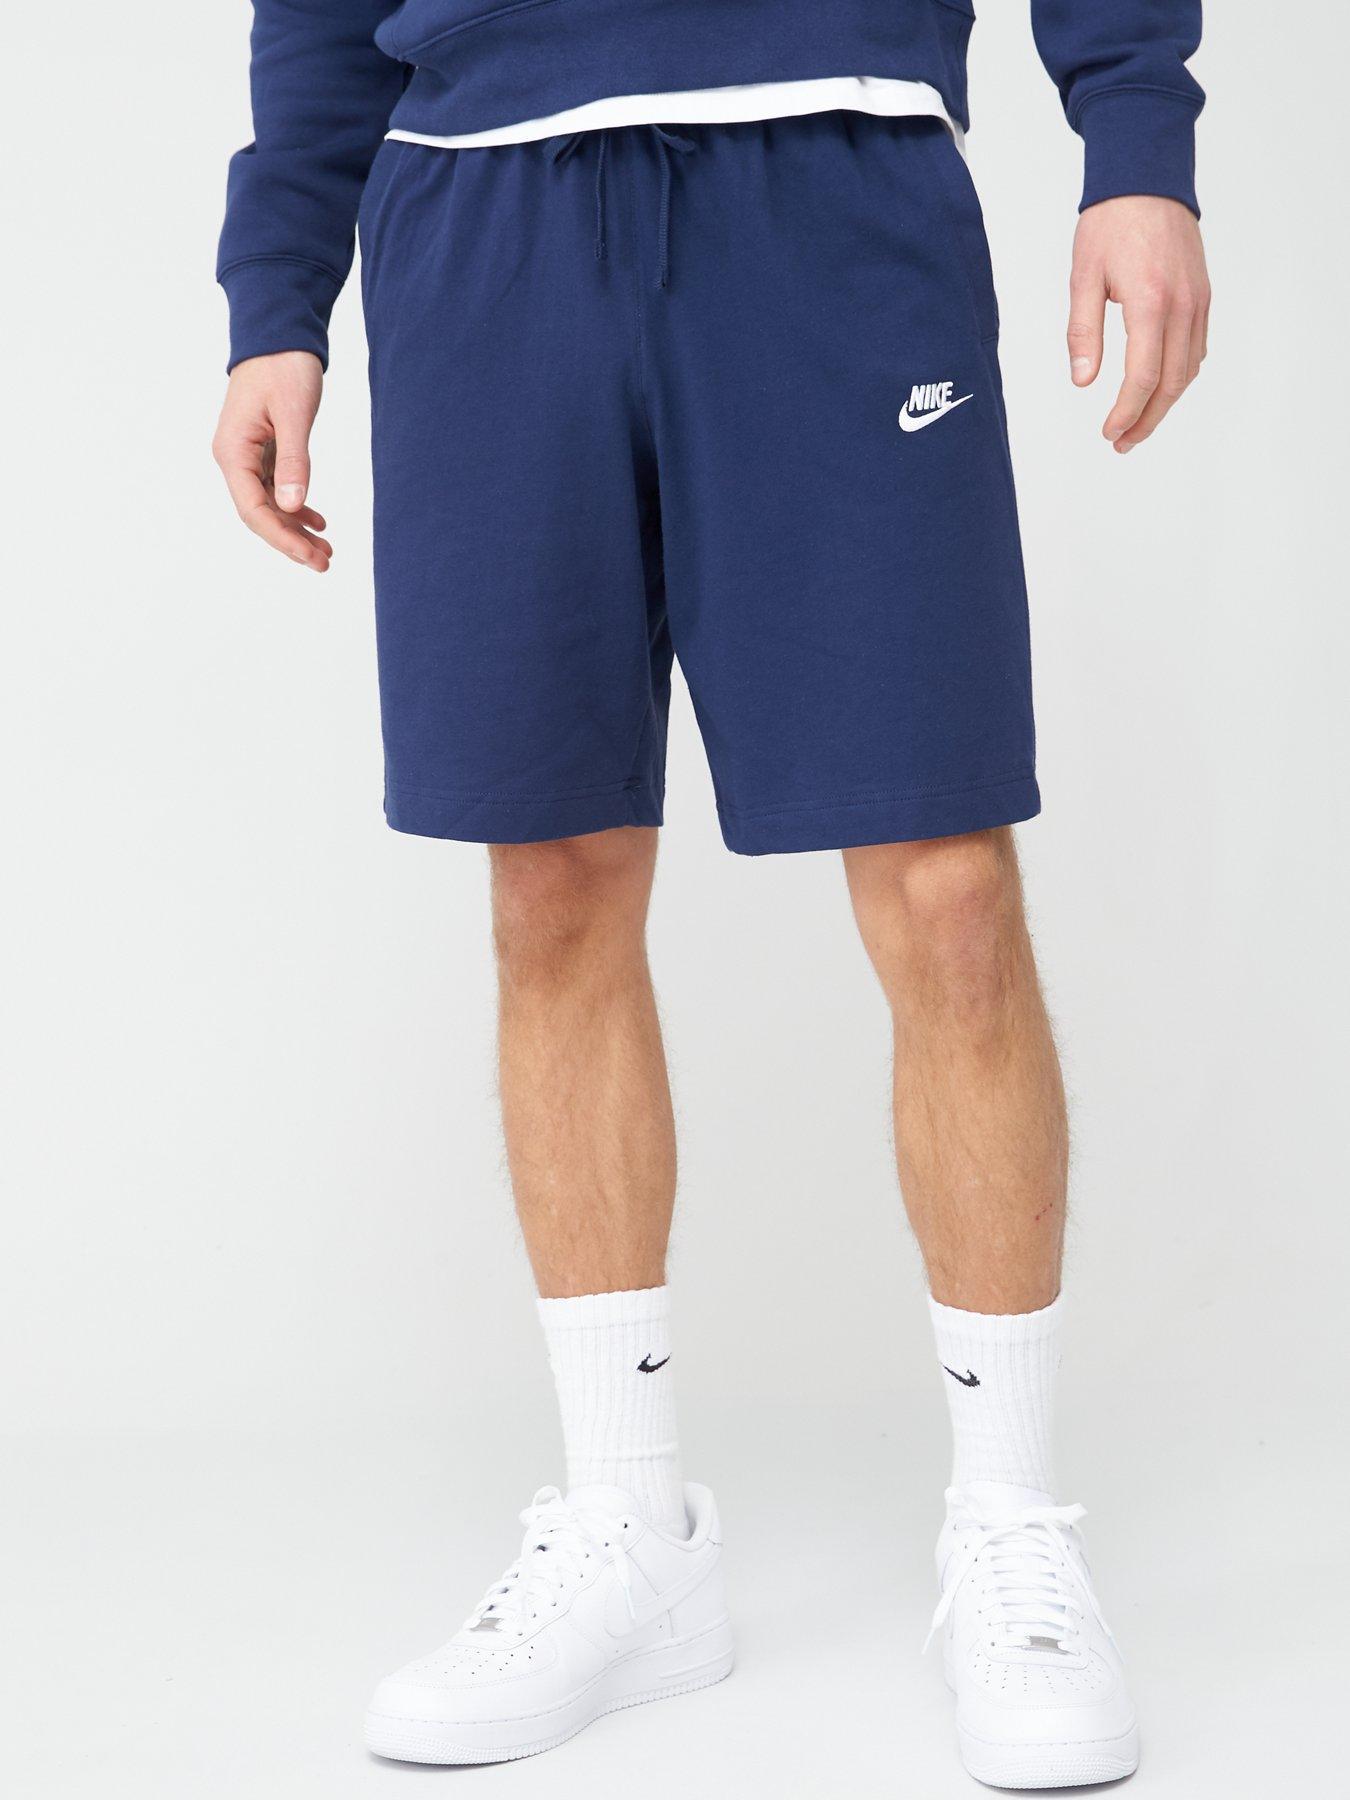 US NAVY Embroidered Mens Athletic Jersey 2 pocket Mesh Basketball Shorts M-5XL